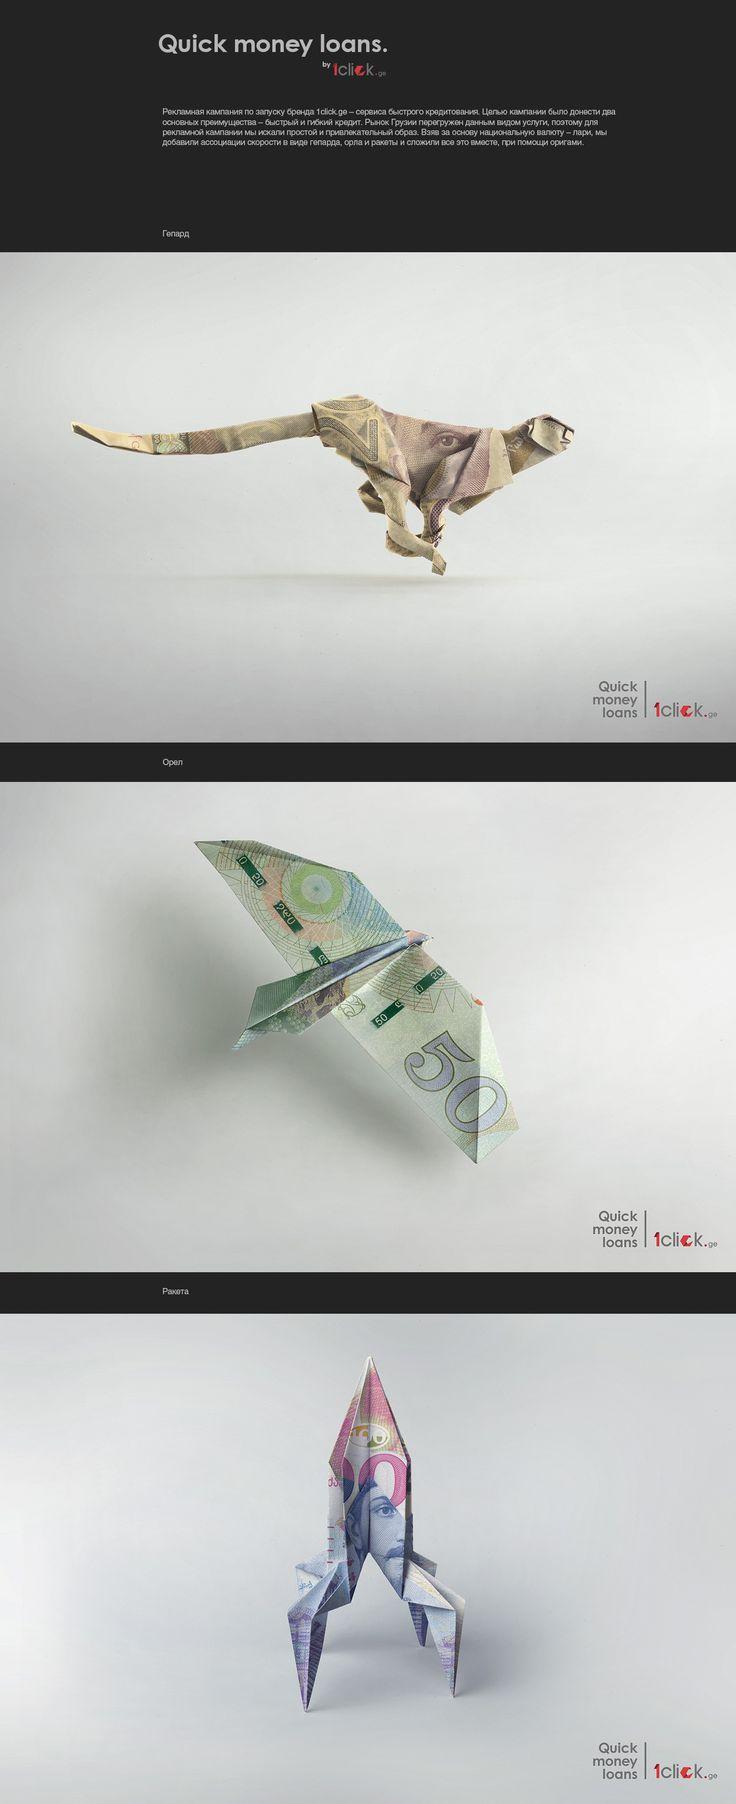 Быстрые кредиты, Реклама © СергейПрокопчук